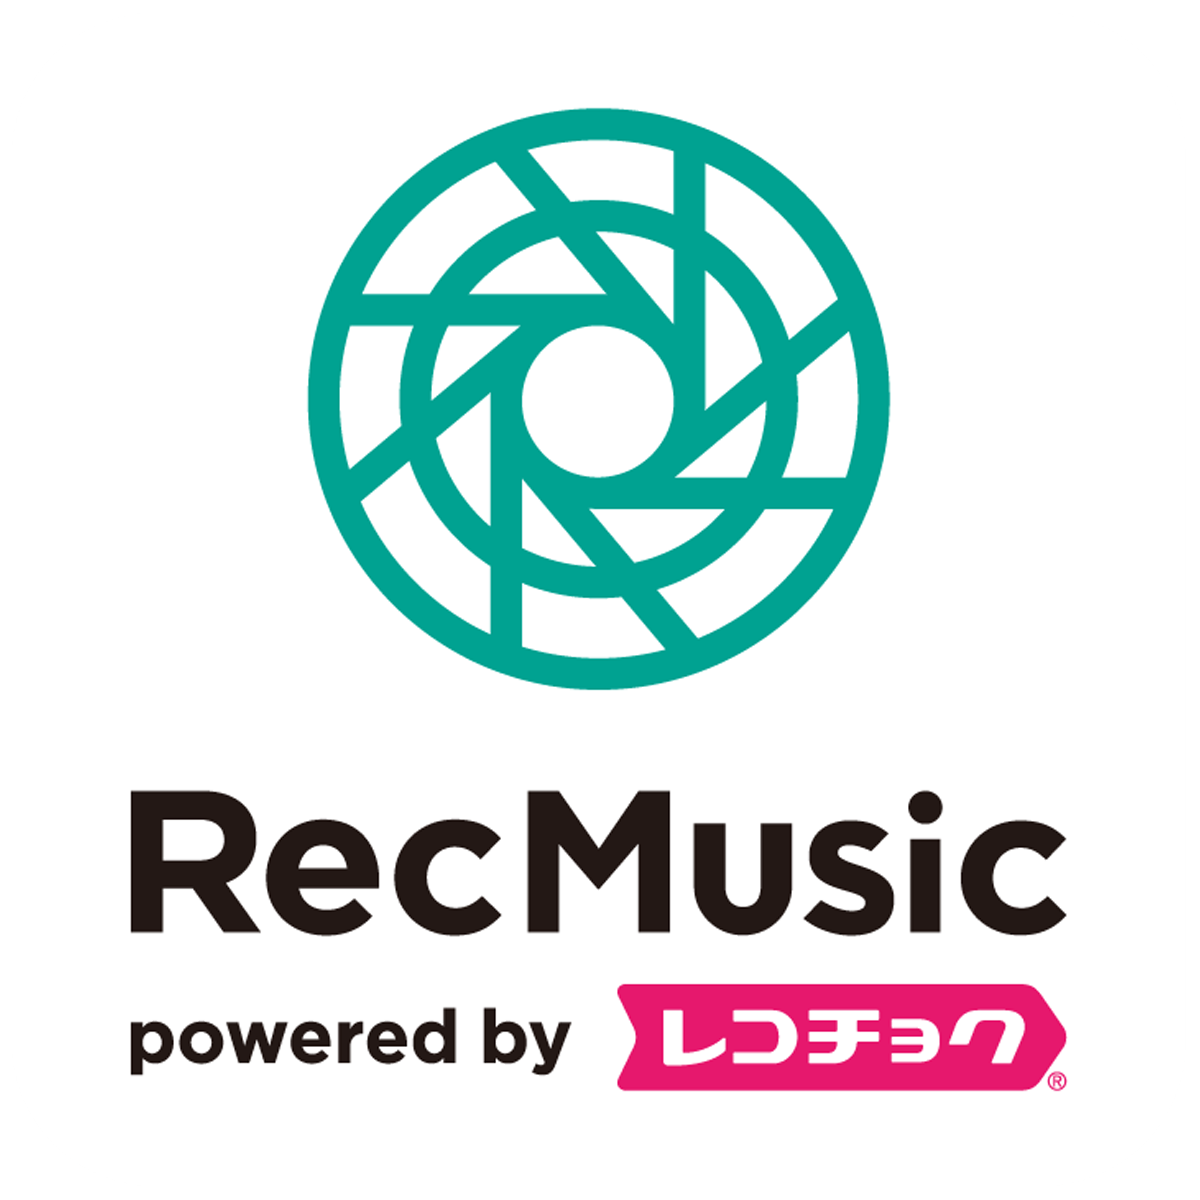 Rec Music Logo